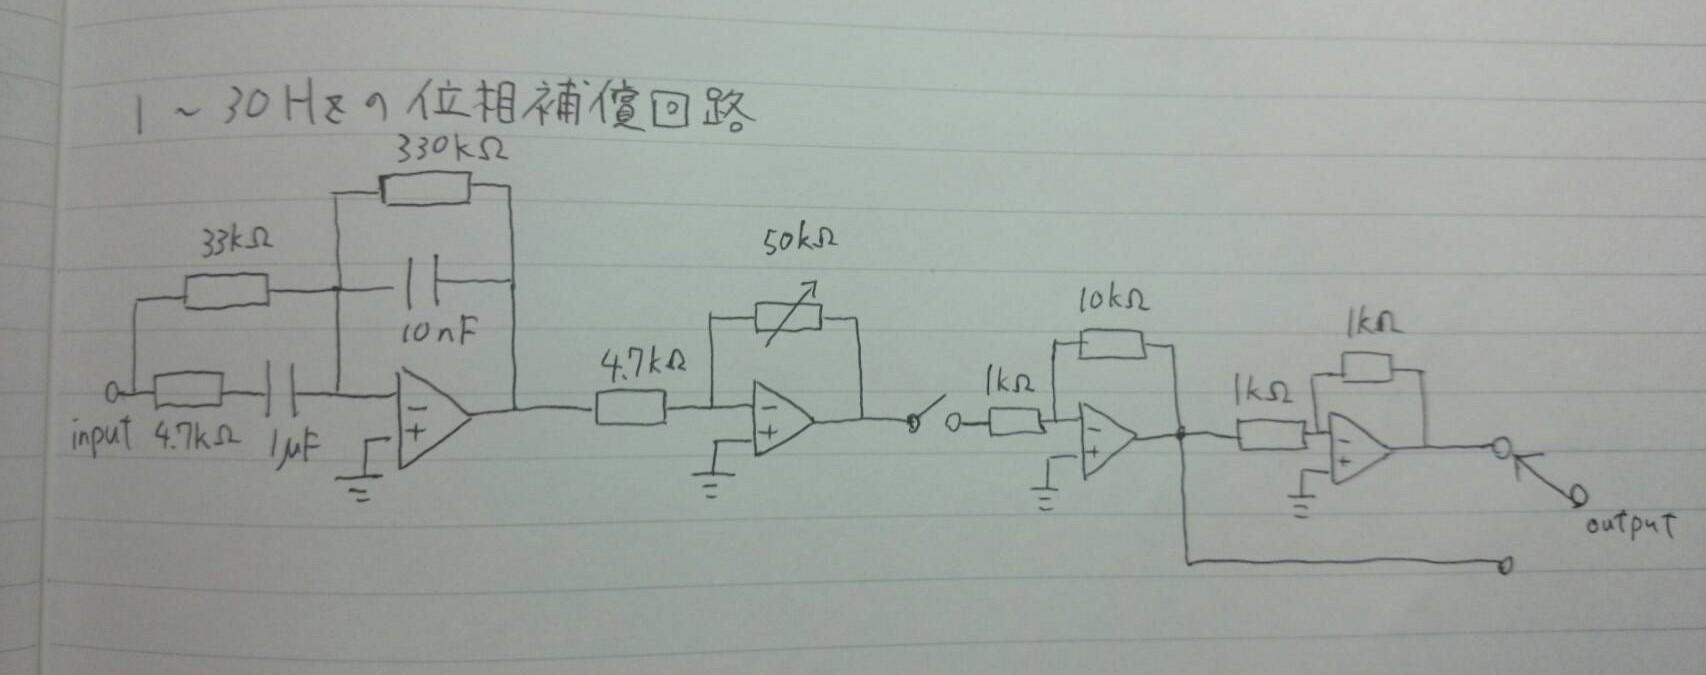 circuitdiagram.jpg